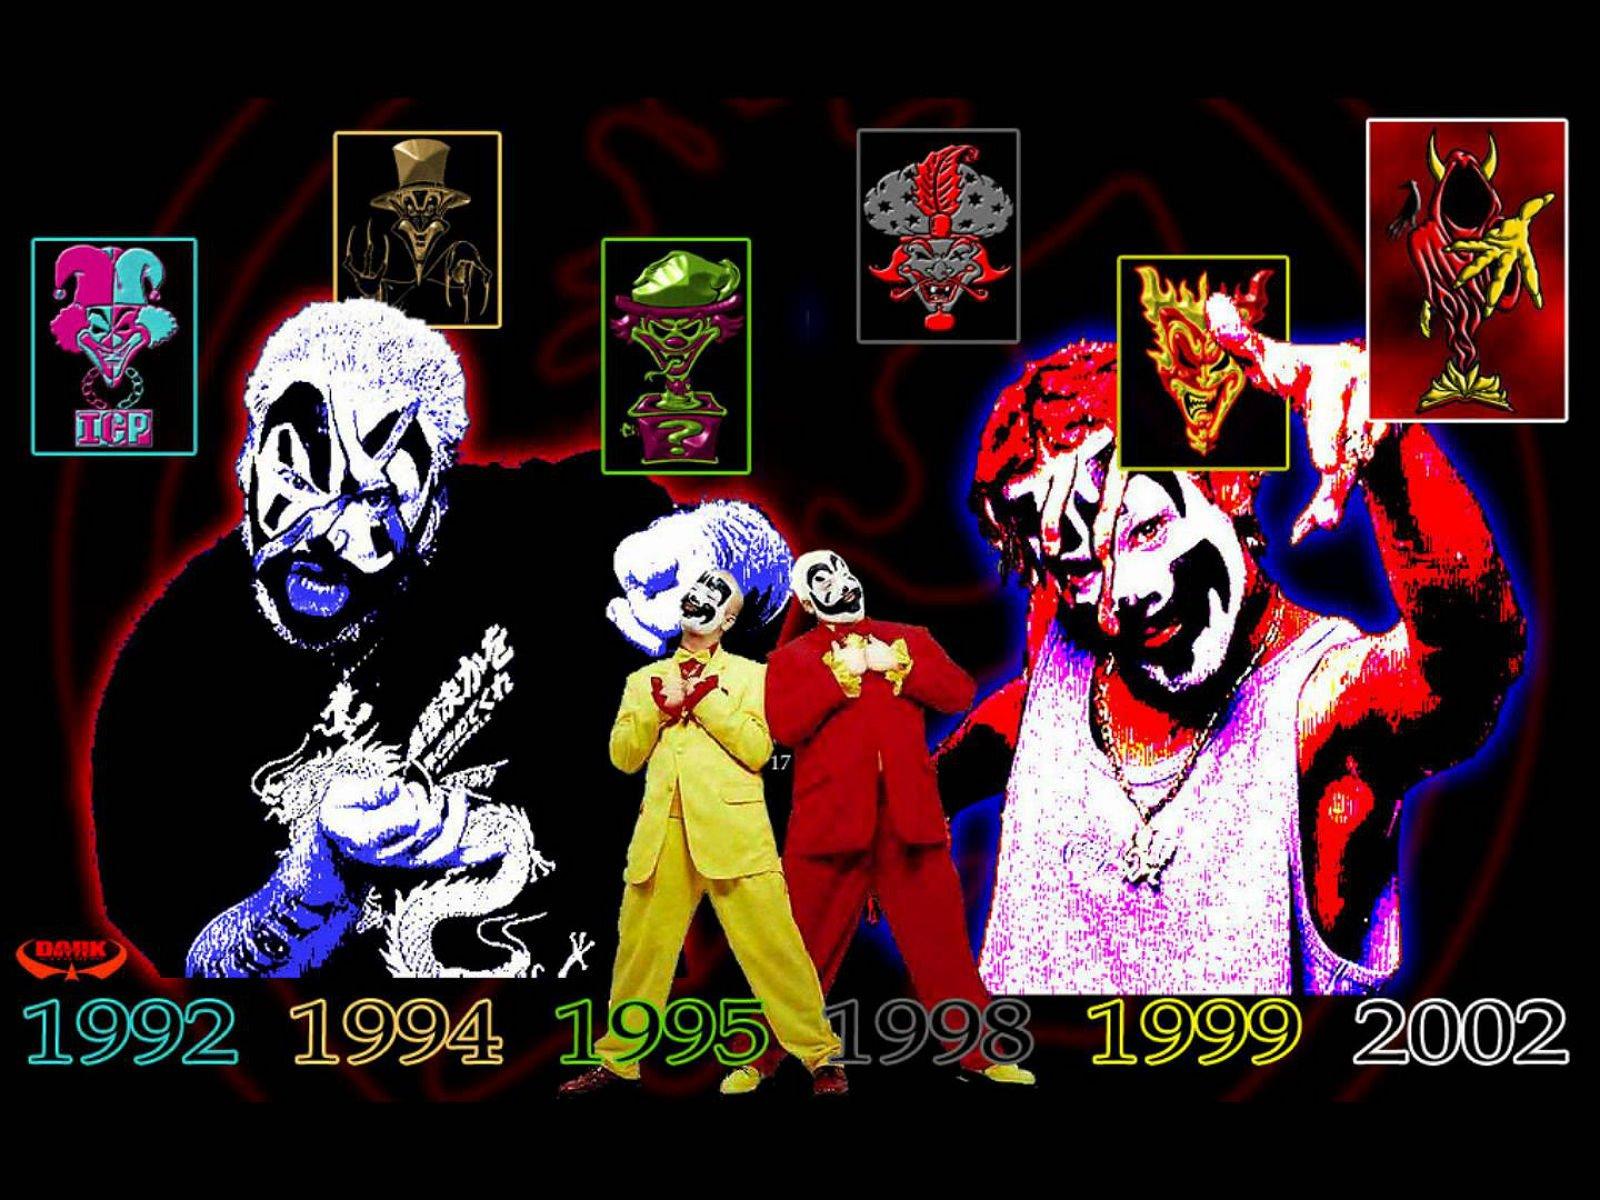 Insane clown posse dating